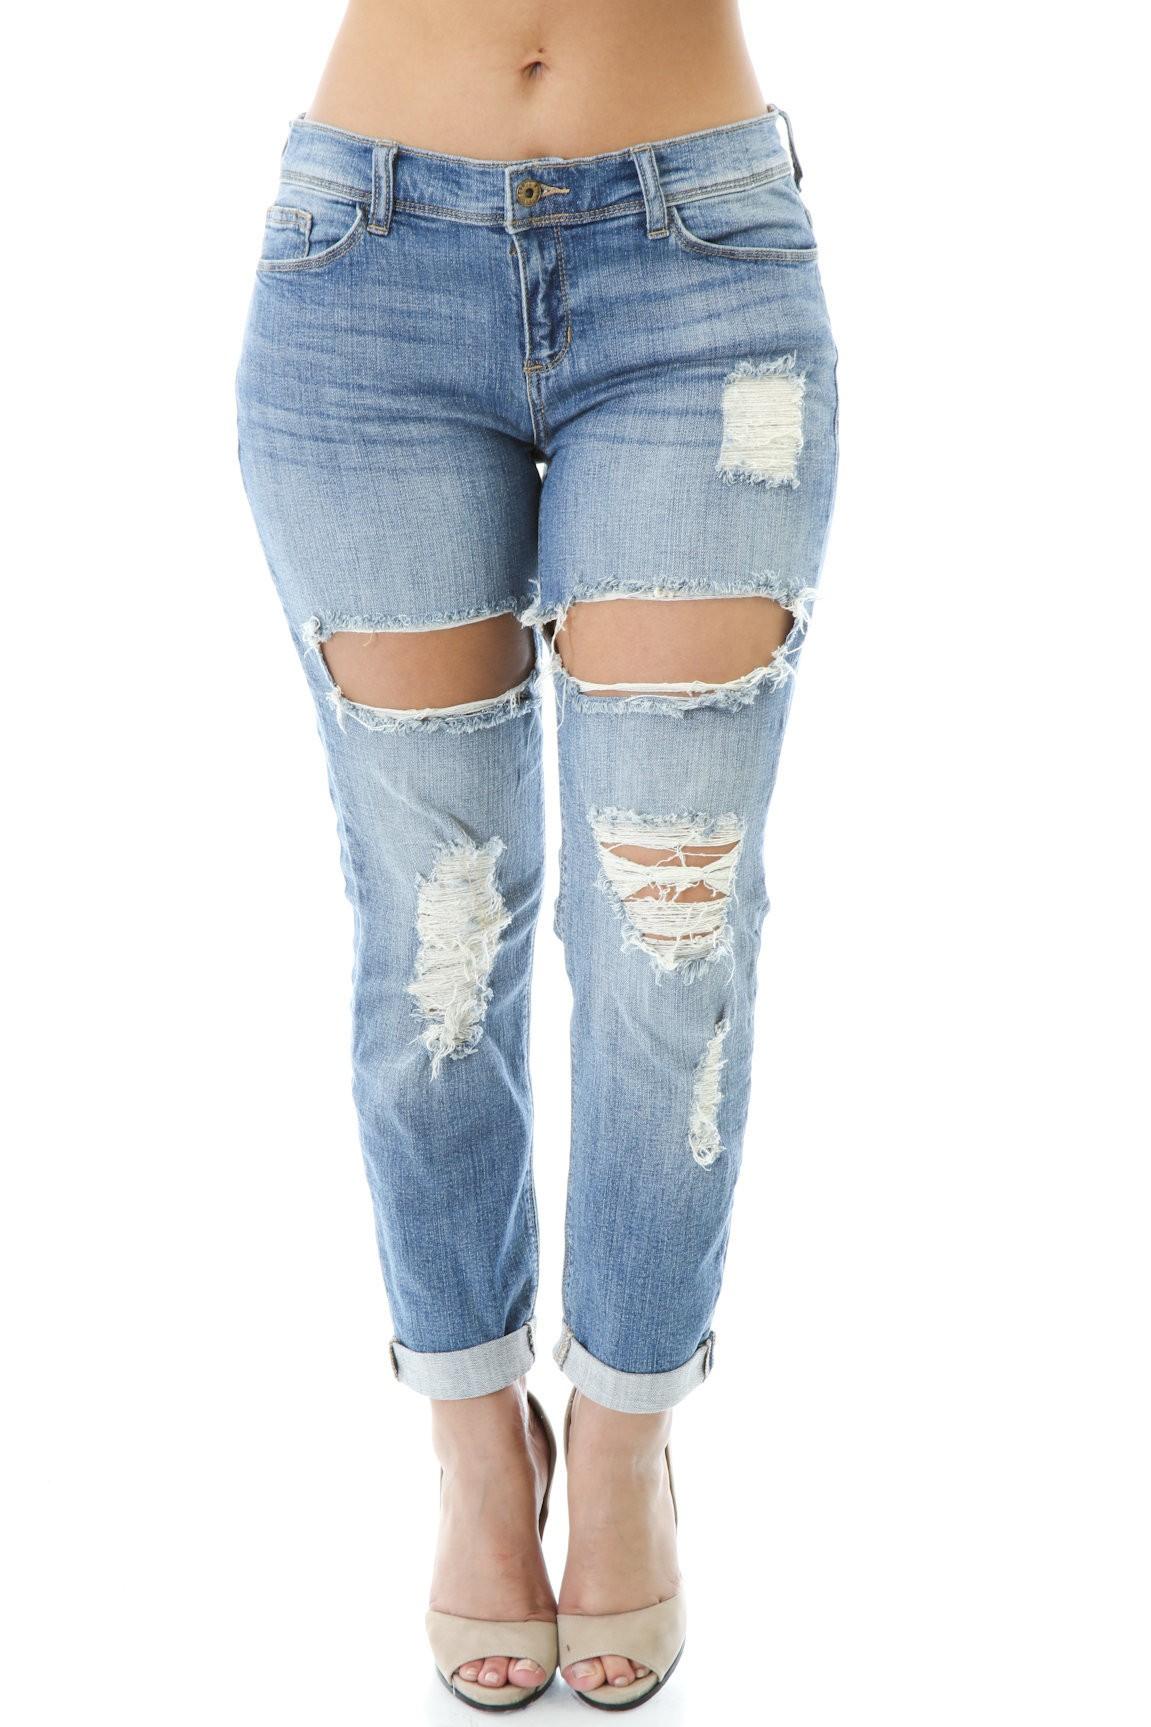 Distress Ways Jeans